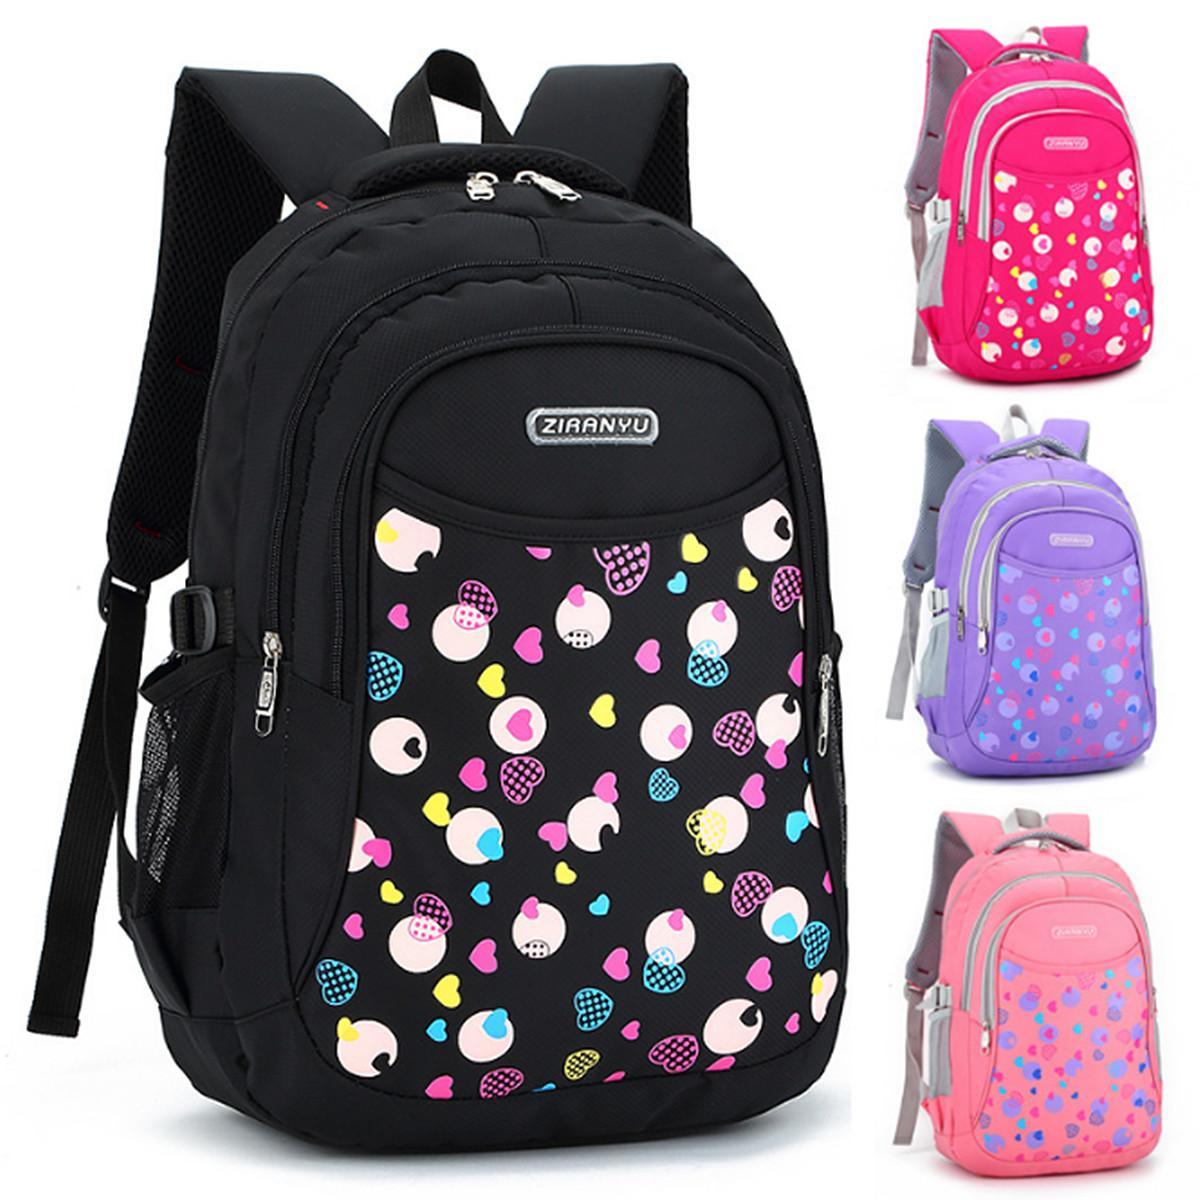 817412bc7a 4Colors Kids Boys Girls Large School Bags Backpack Shoulder Bookbags  Fashion Rucksack Black